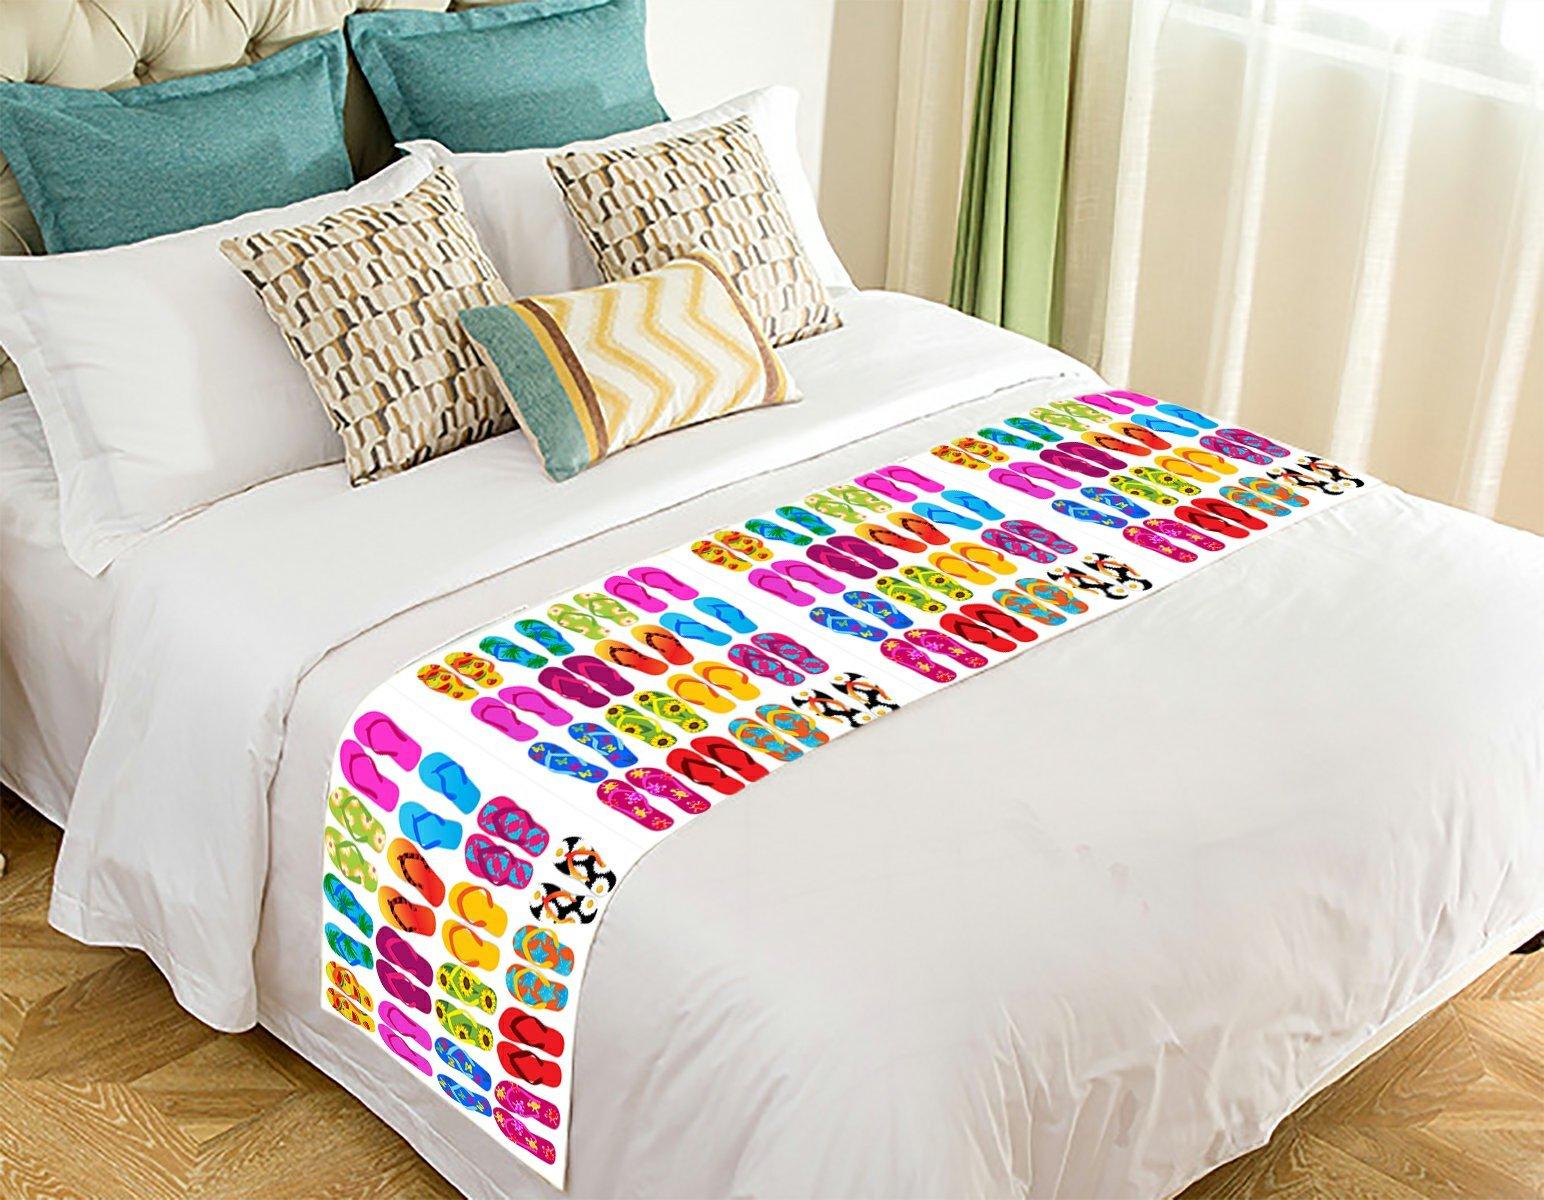 NNBZ Custom Colorful Beach Flip Flops Print Bed Runner Cotton Bedding Scarf Bedding Decor 20x95 inches